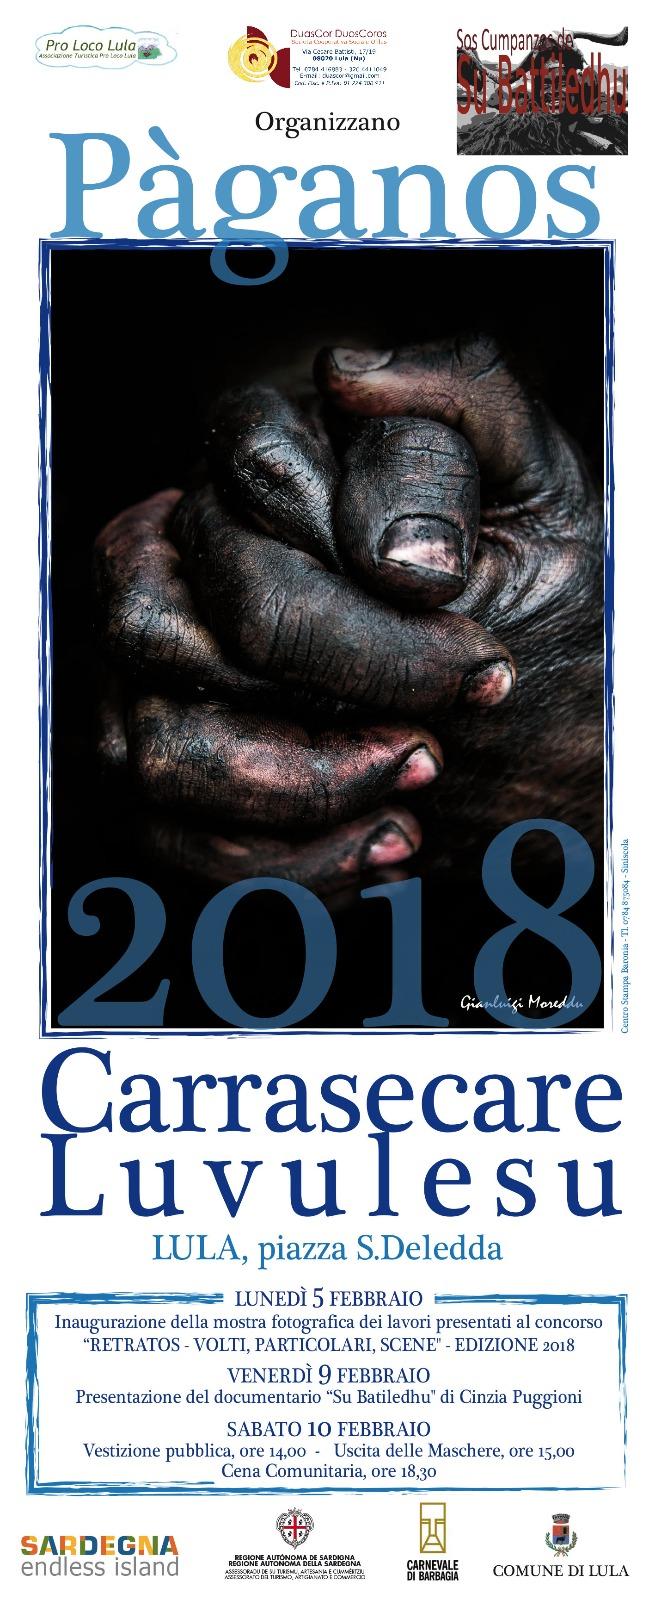 PÀGANOS – CARRASECARE LUVULESU 2018